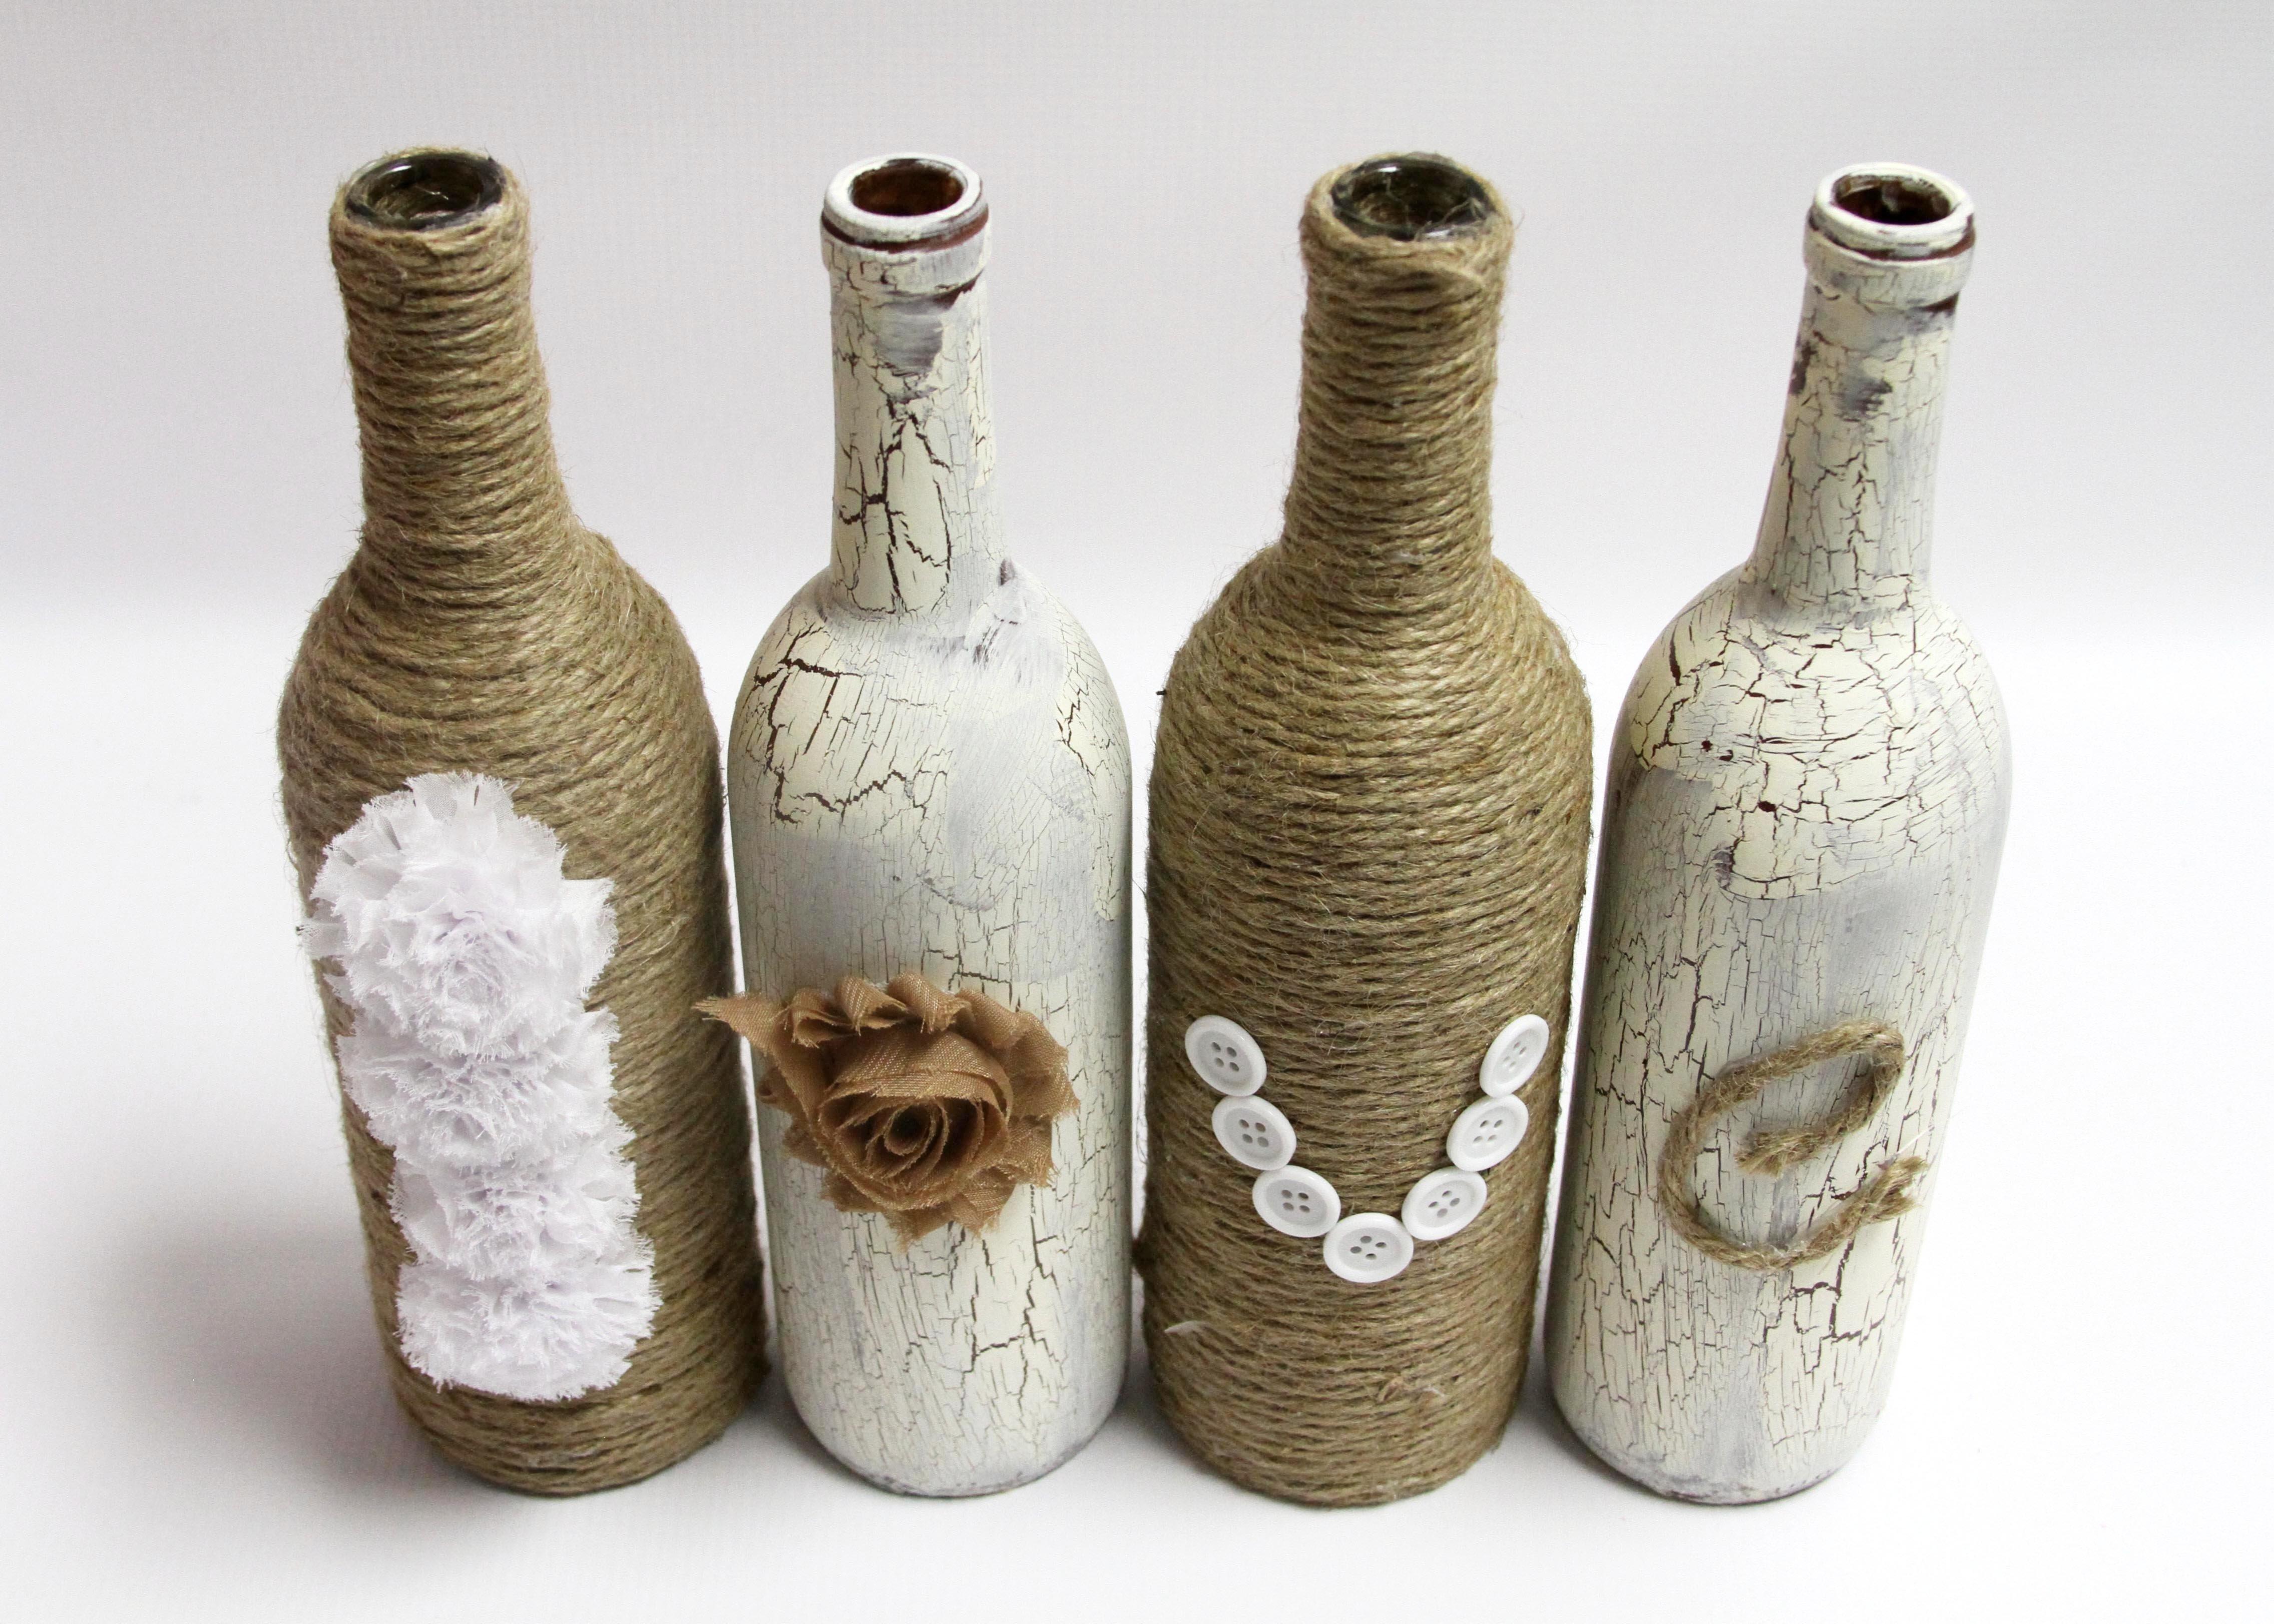 10 Most Popular Craft Ideas For Wine Bottles diy wine bottle love craft 2020